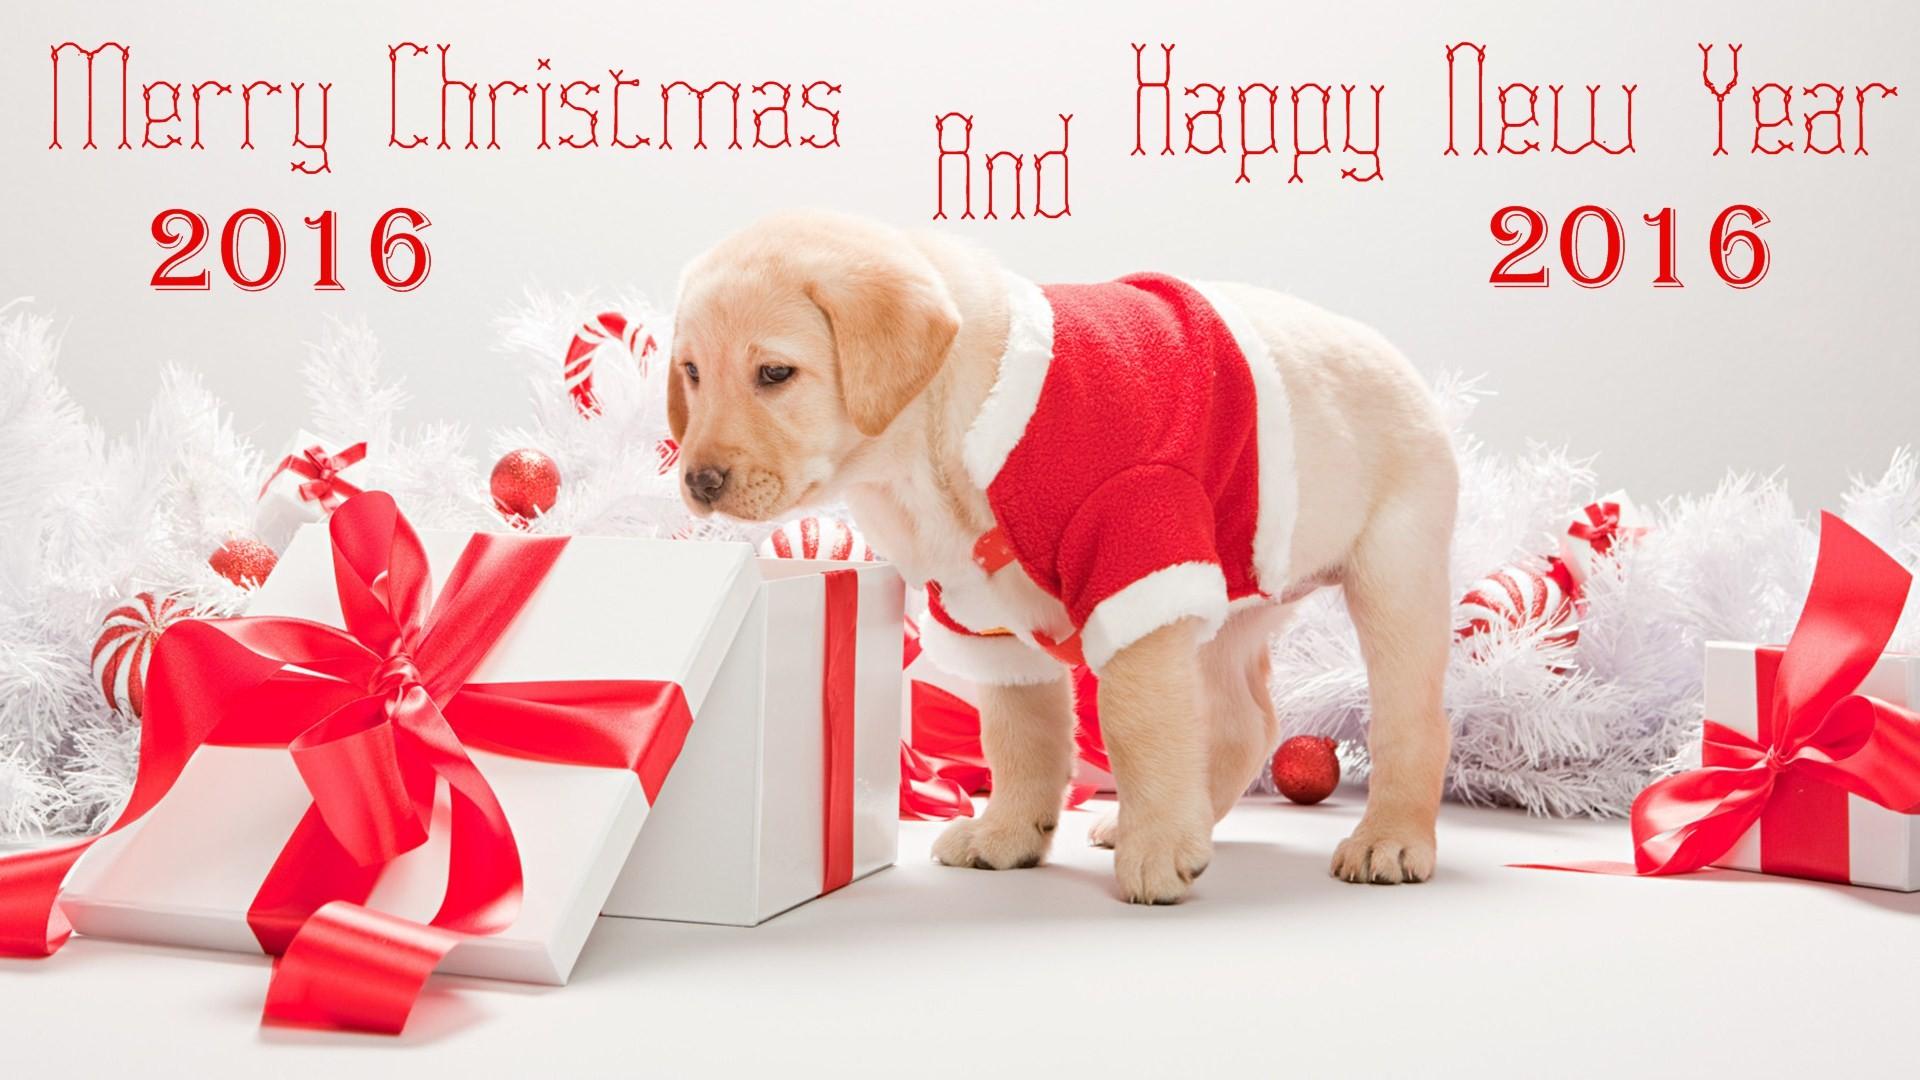 Cute Christmas wallpaper  Download free beautiful HD